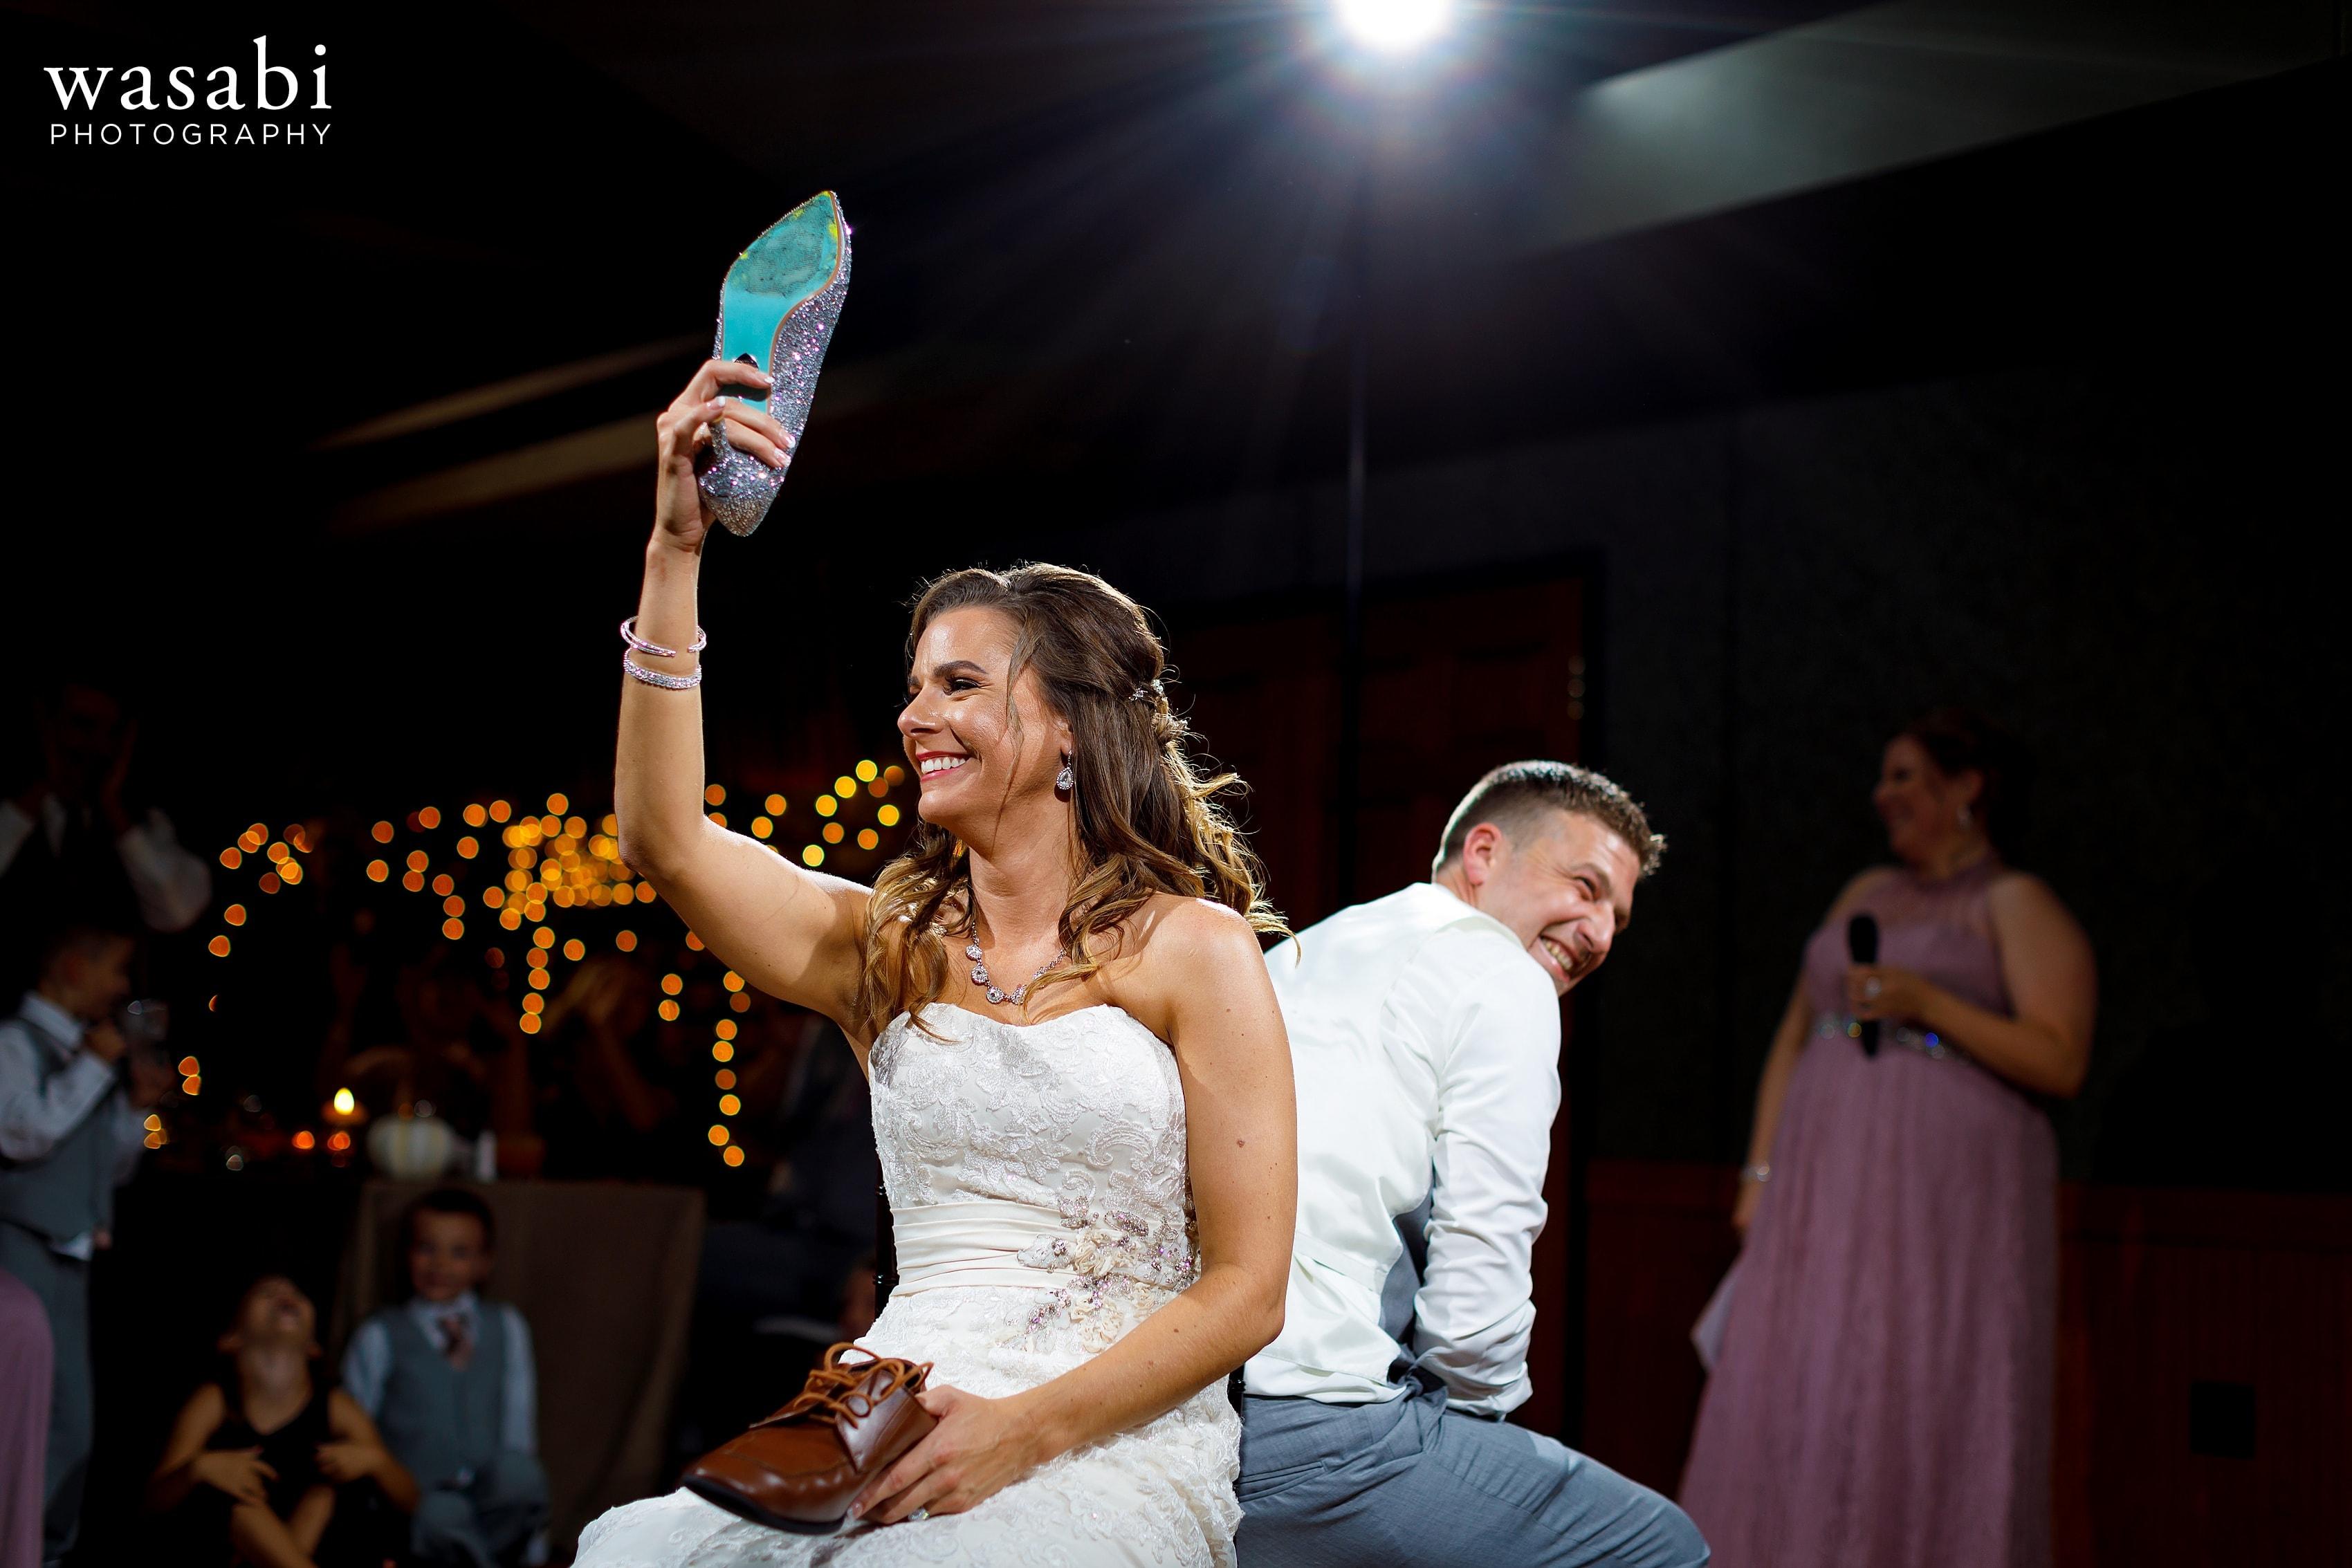 Bride and groom shoe game during Buck's Run Golf Club wedding reception in Mount Pleasant, Michigan.